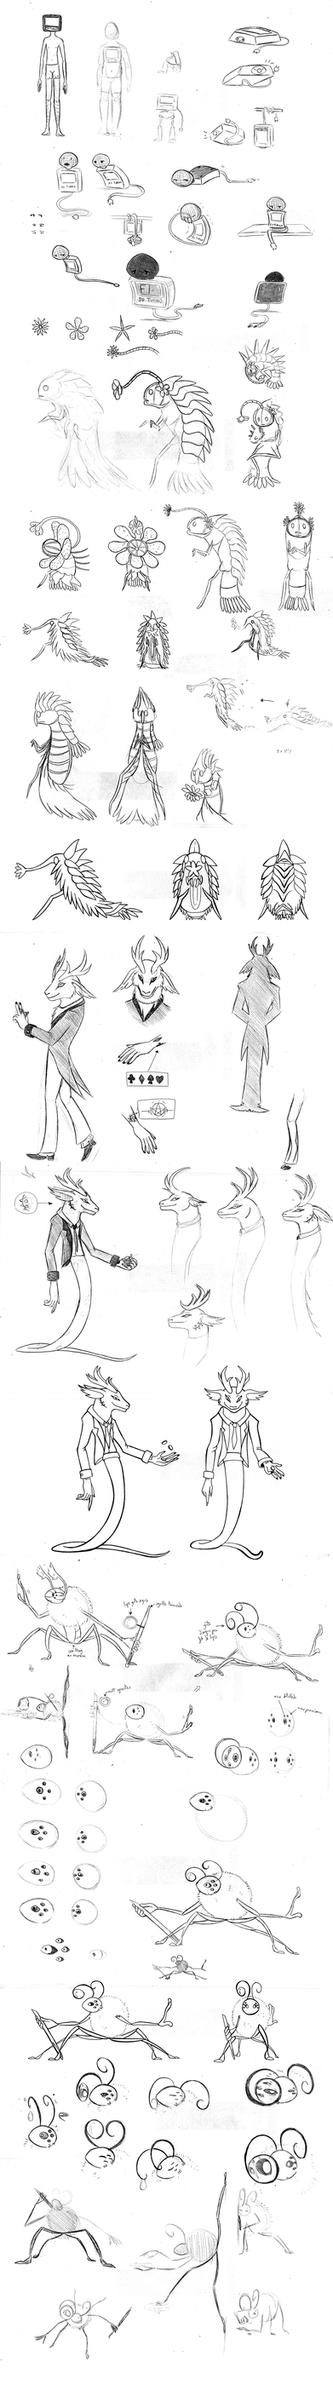 School - Character design sketchdump by Fluna